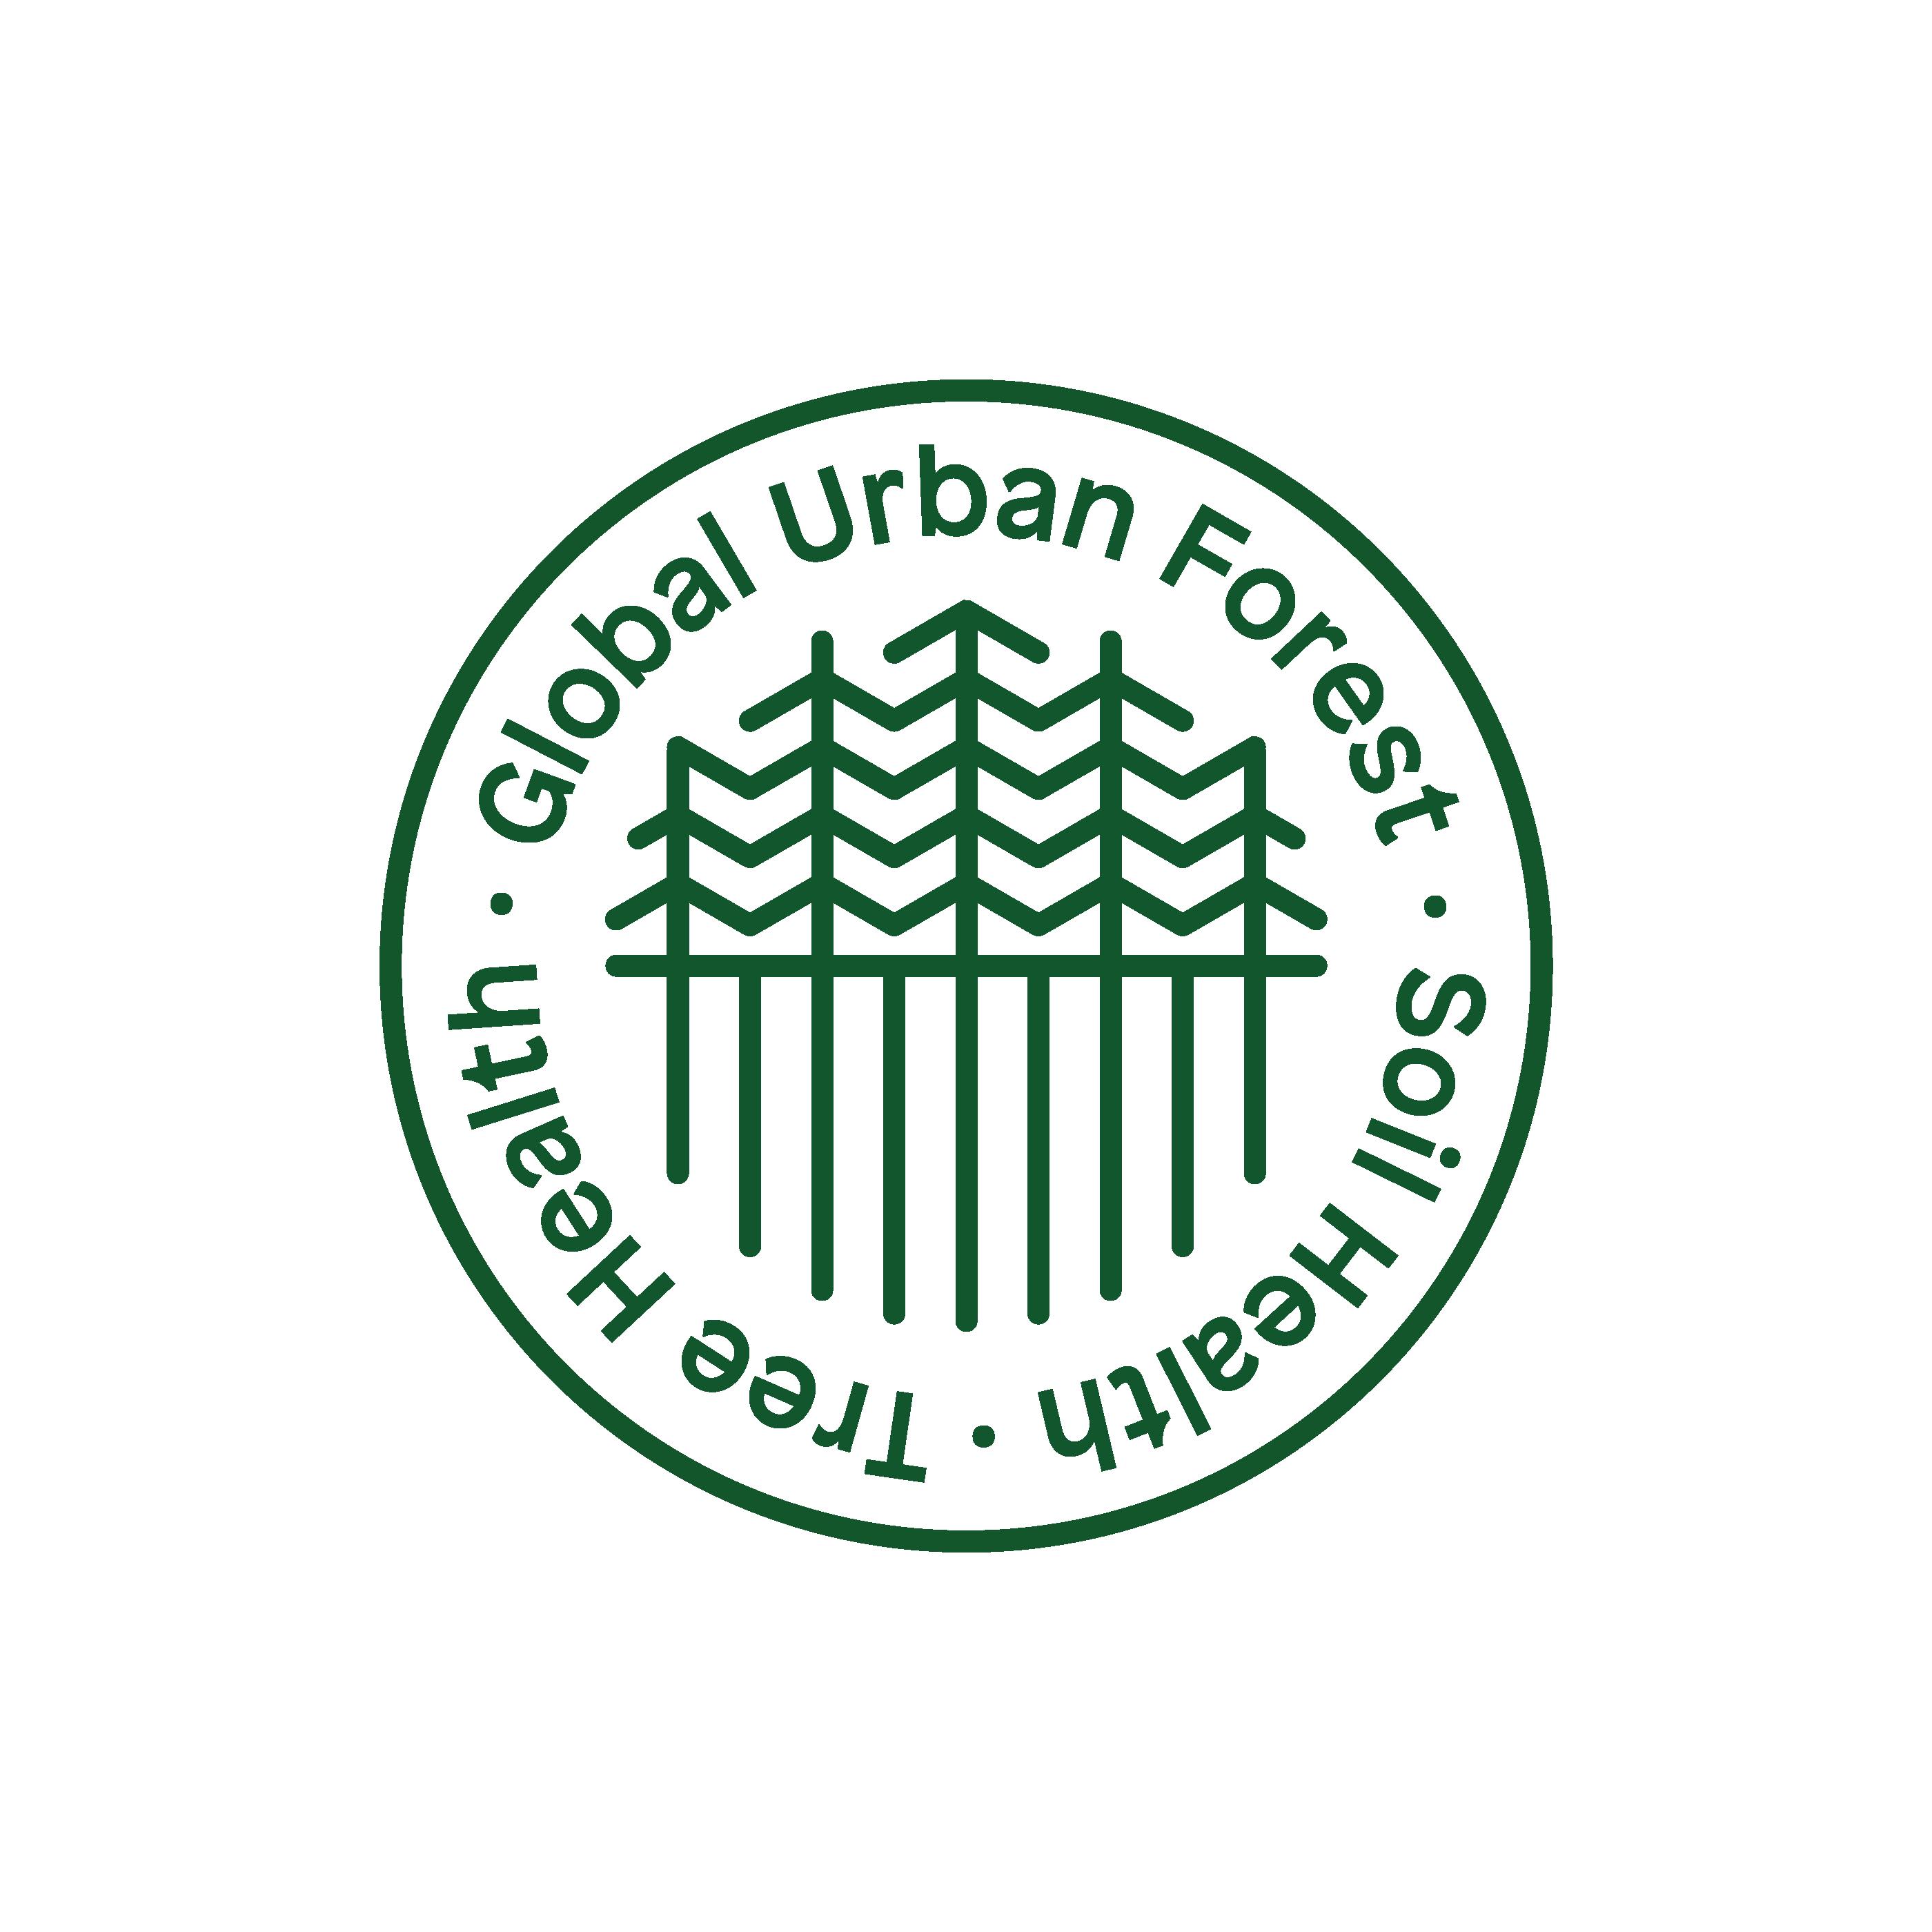 GUF_03_Logo_Brandmark_wDots.png